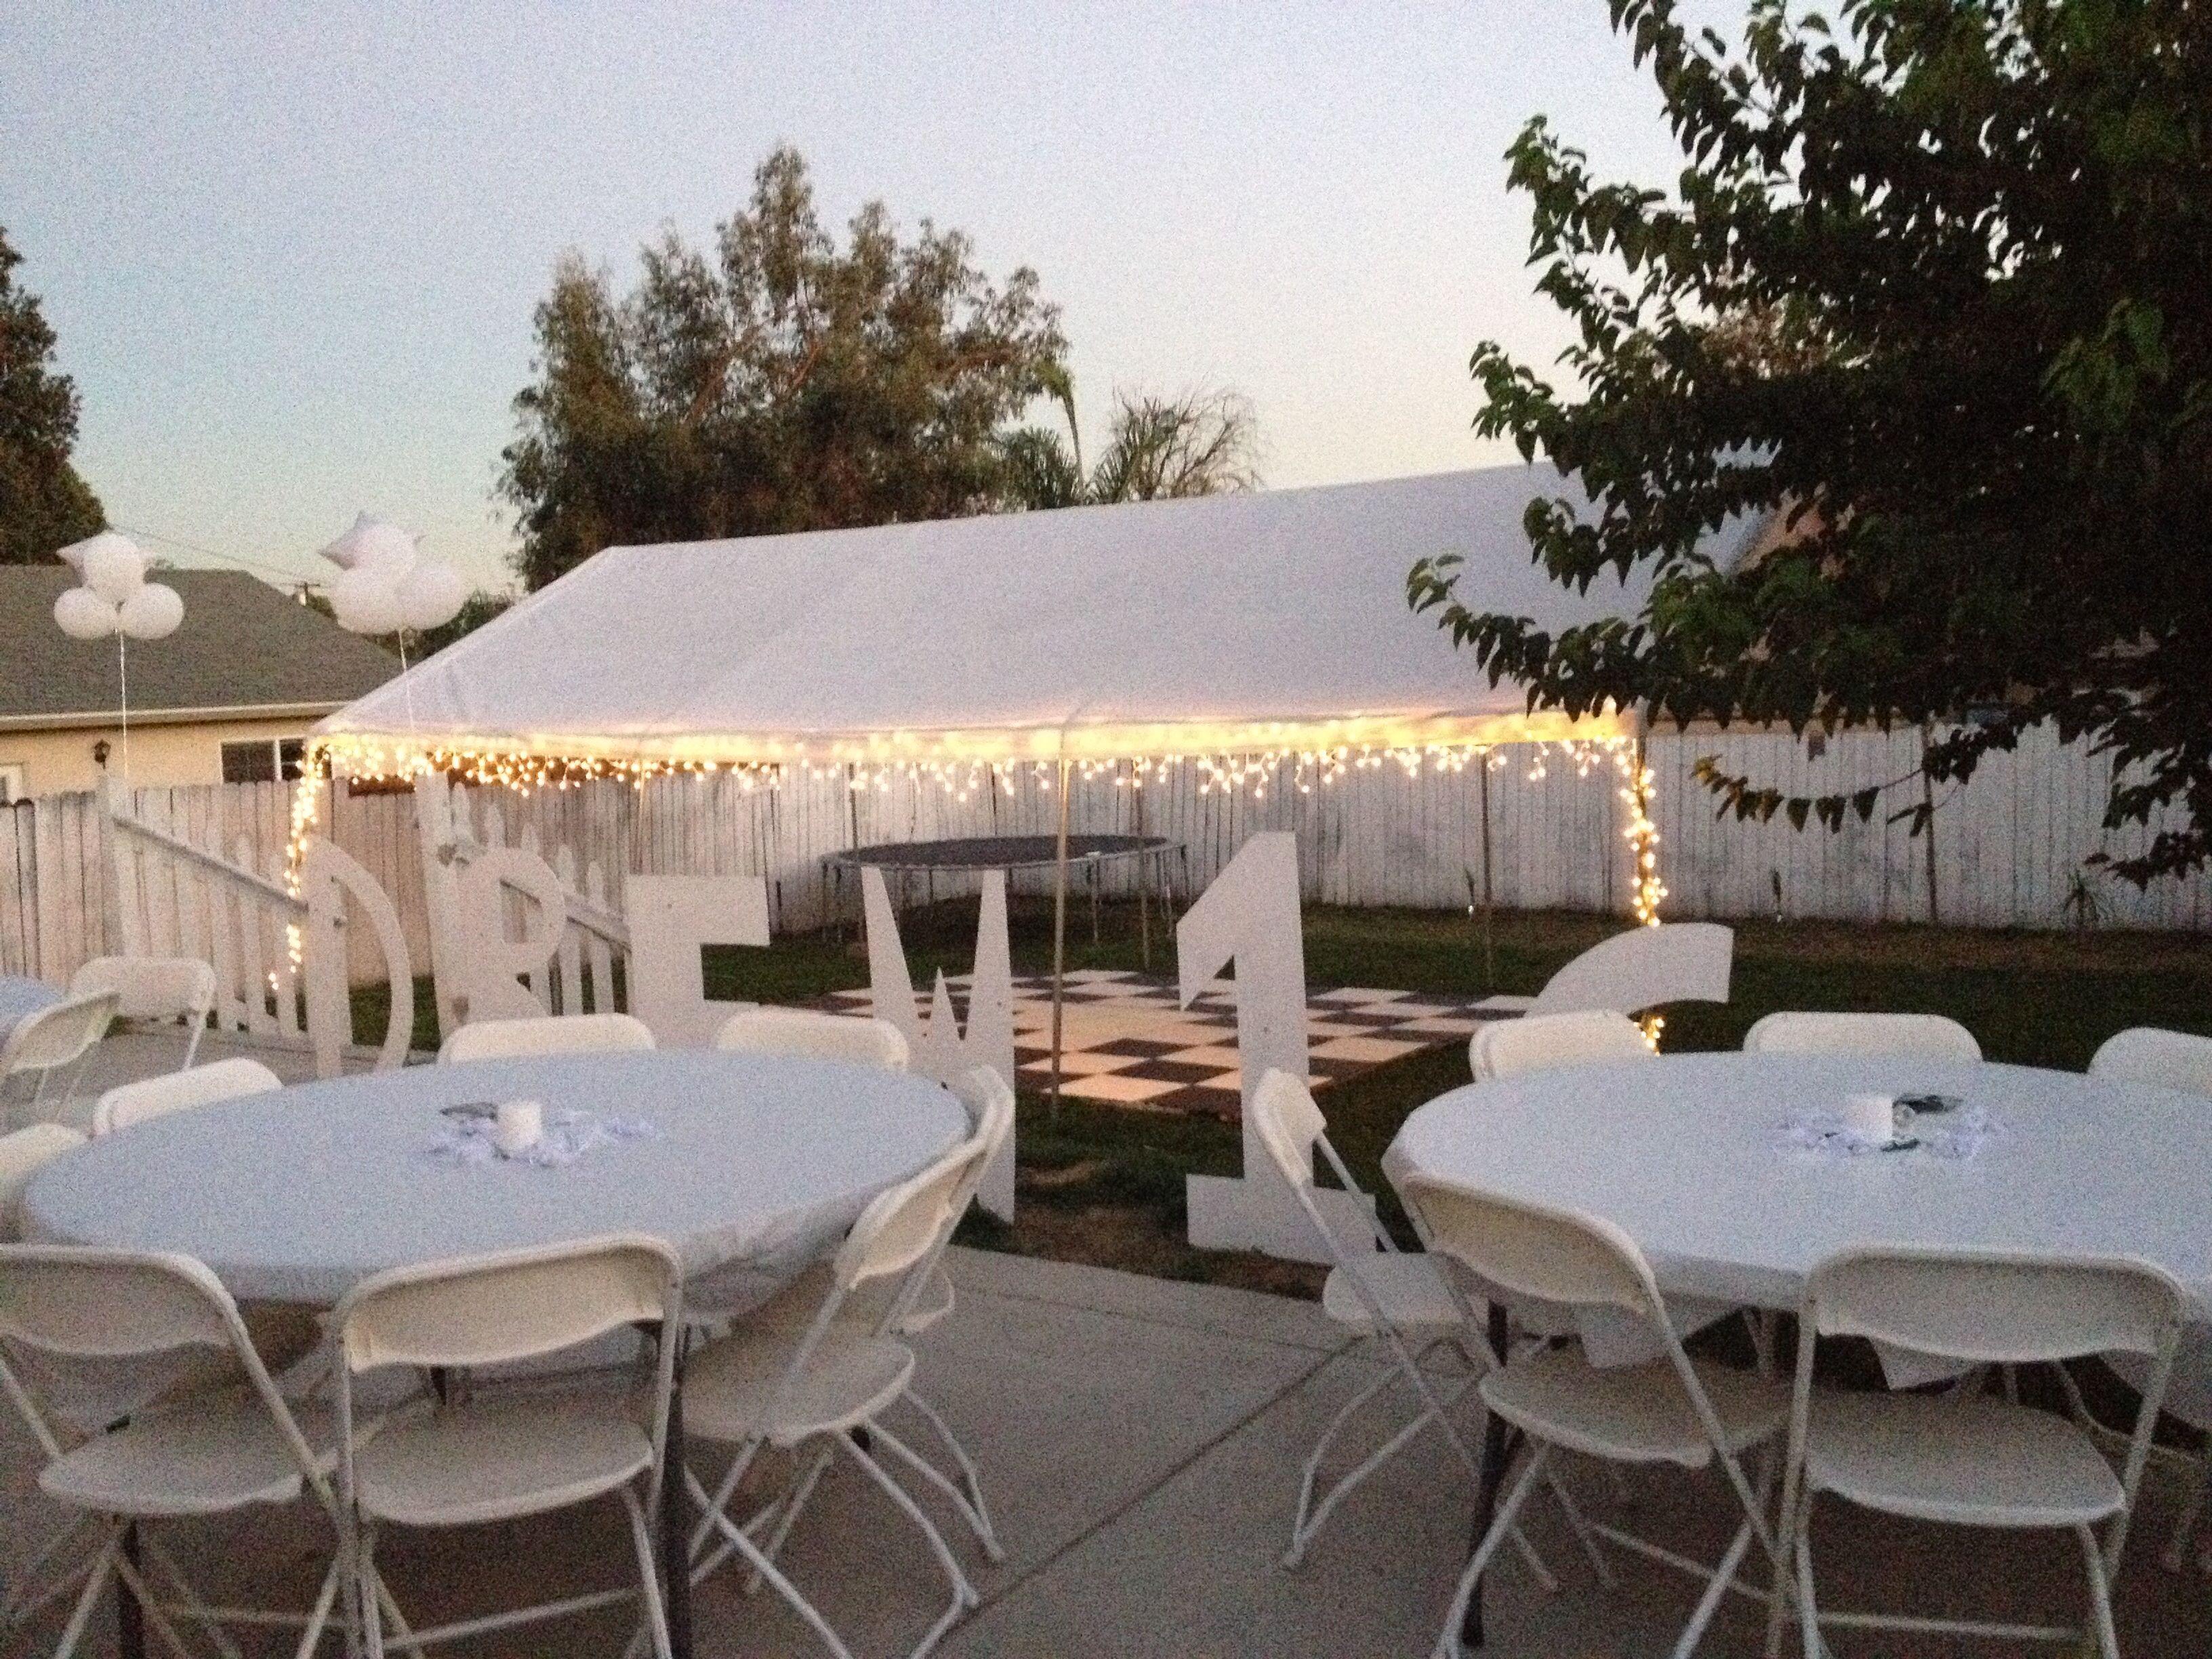 Sweet Sixteen Backyard Party Ideas  All white party backyard set up